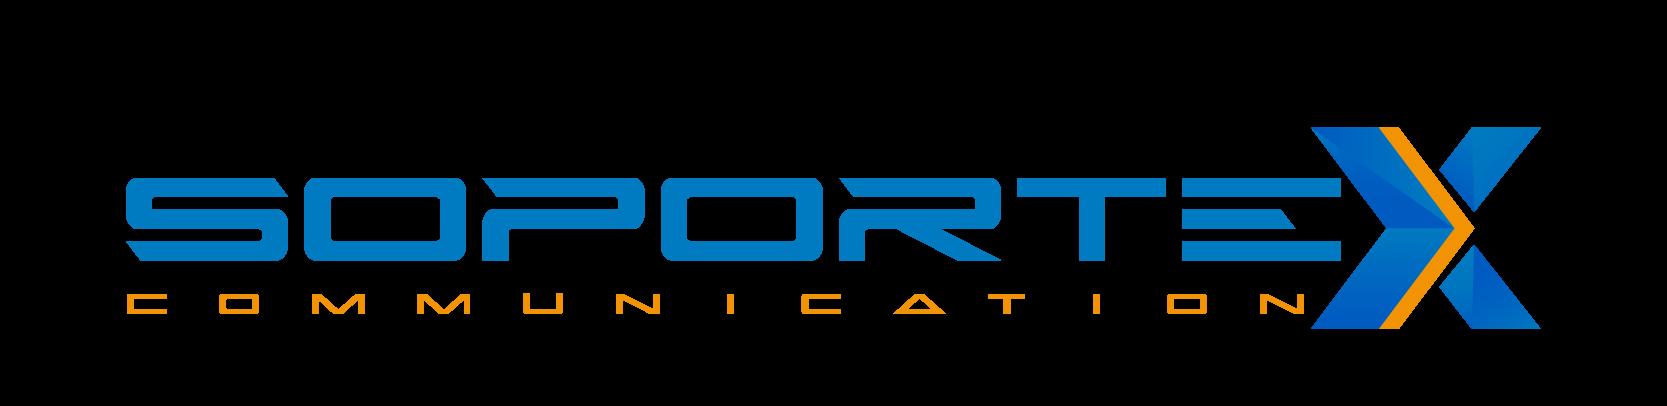 Soportex Communication